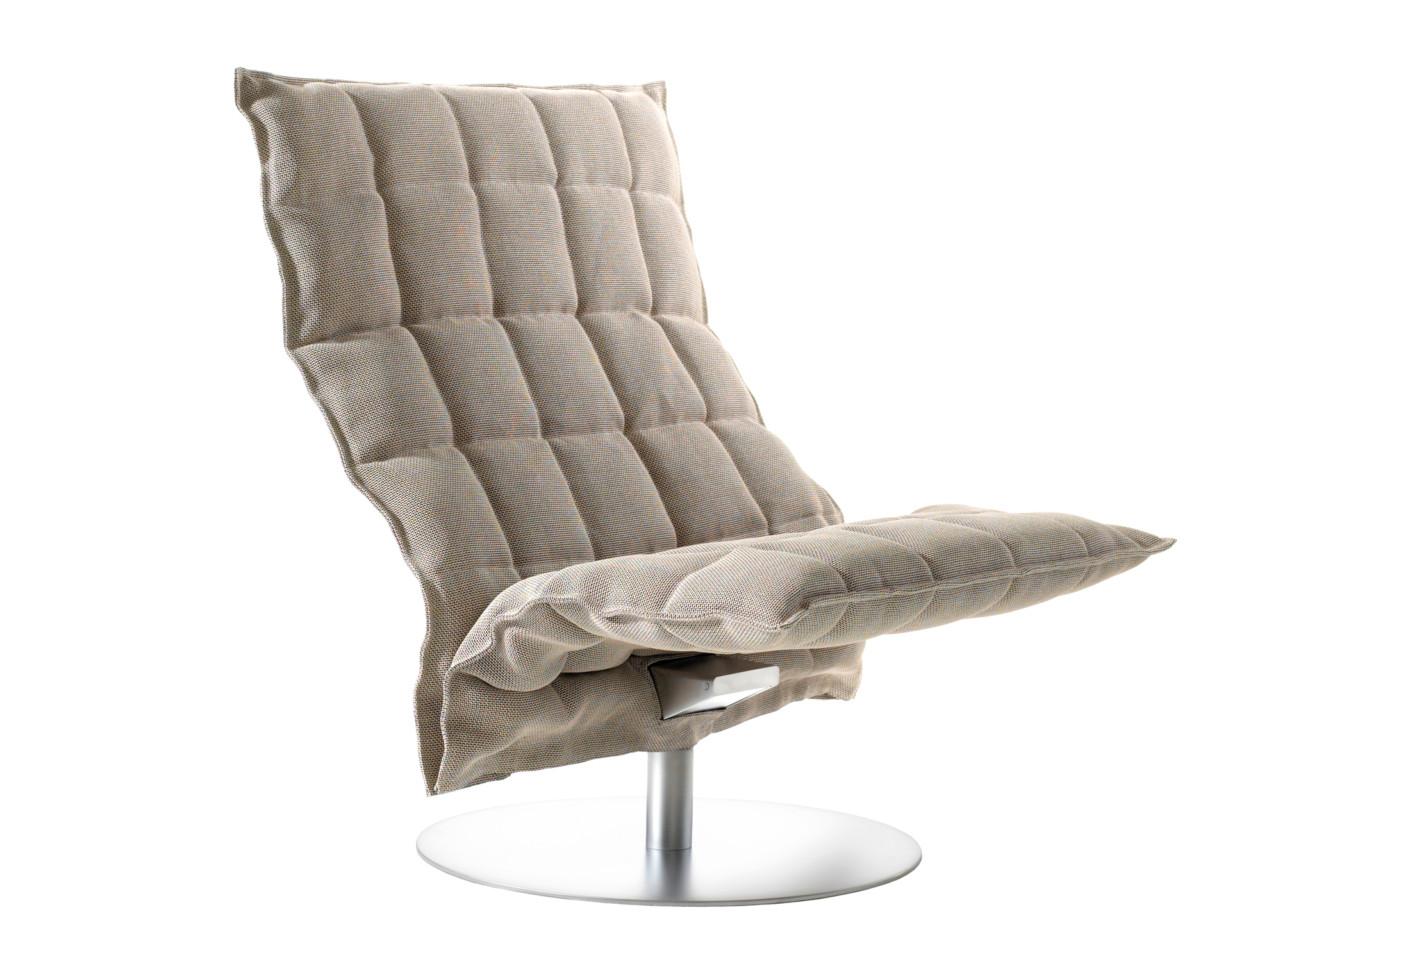 swivel chair mechanism suppliers stryker evacuation k by woodnotes stylepark